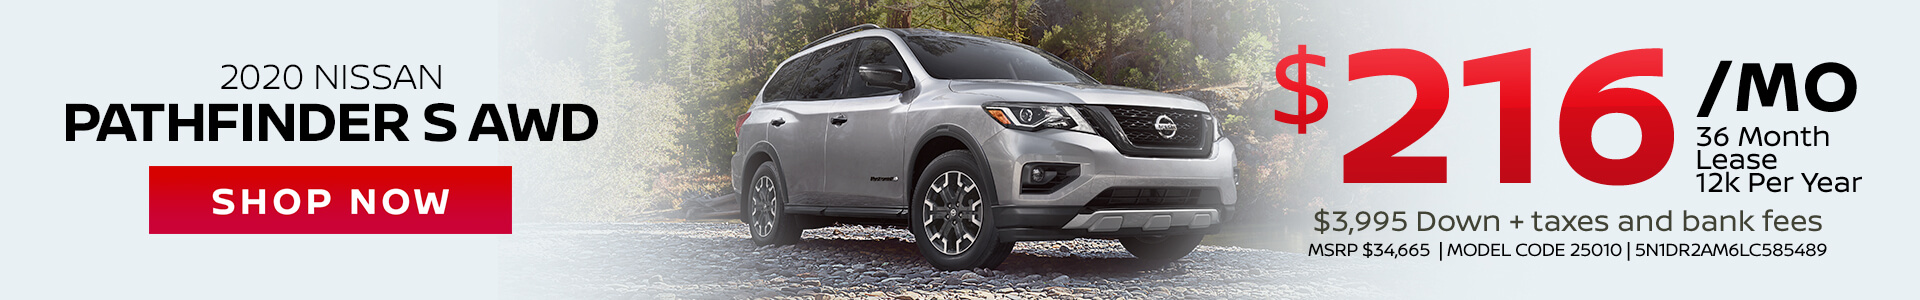 Nissan Pathfinder $216 Lease